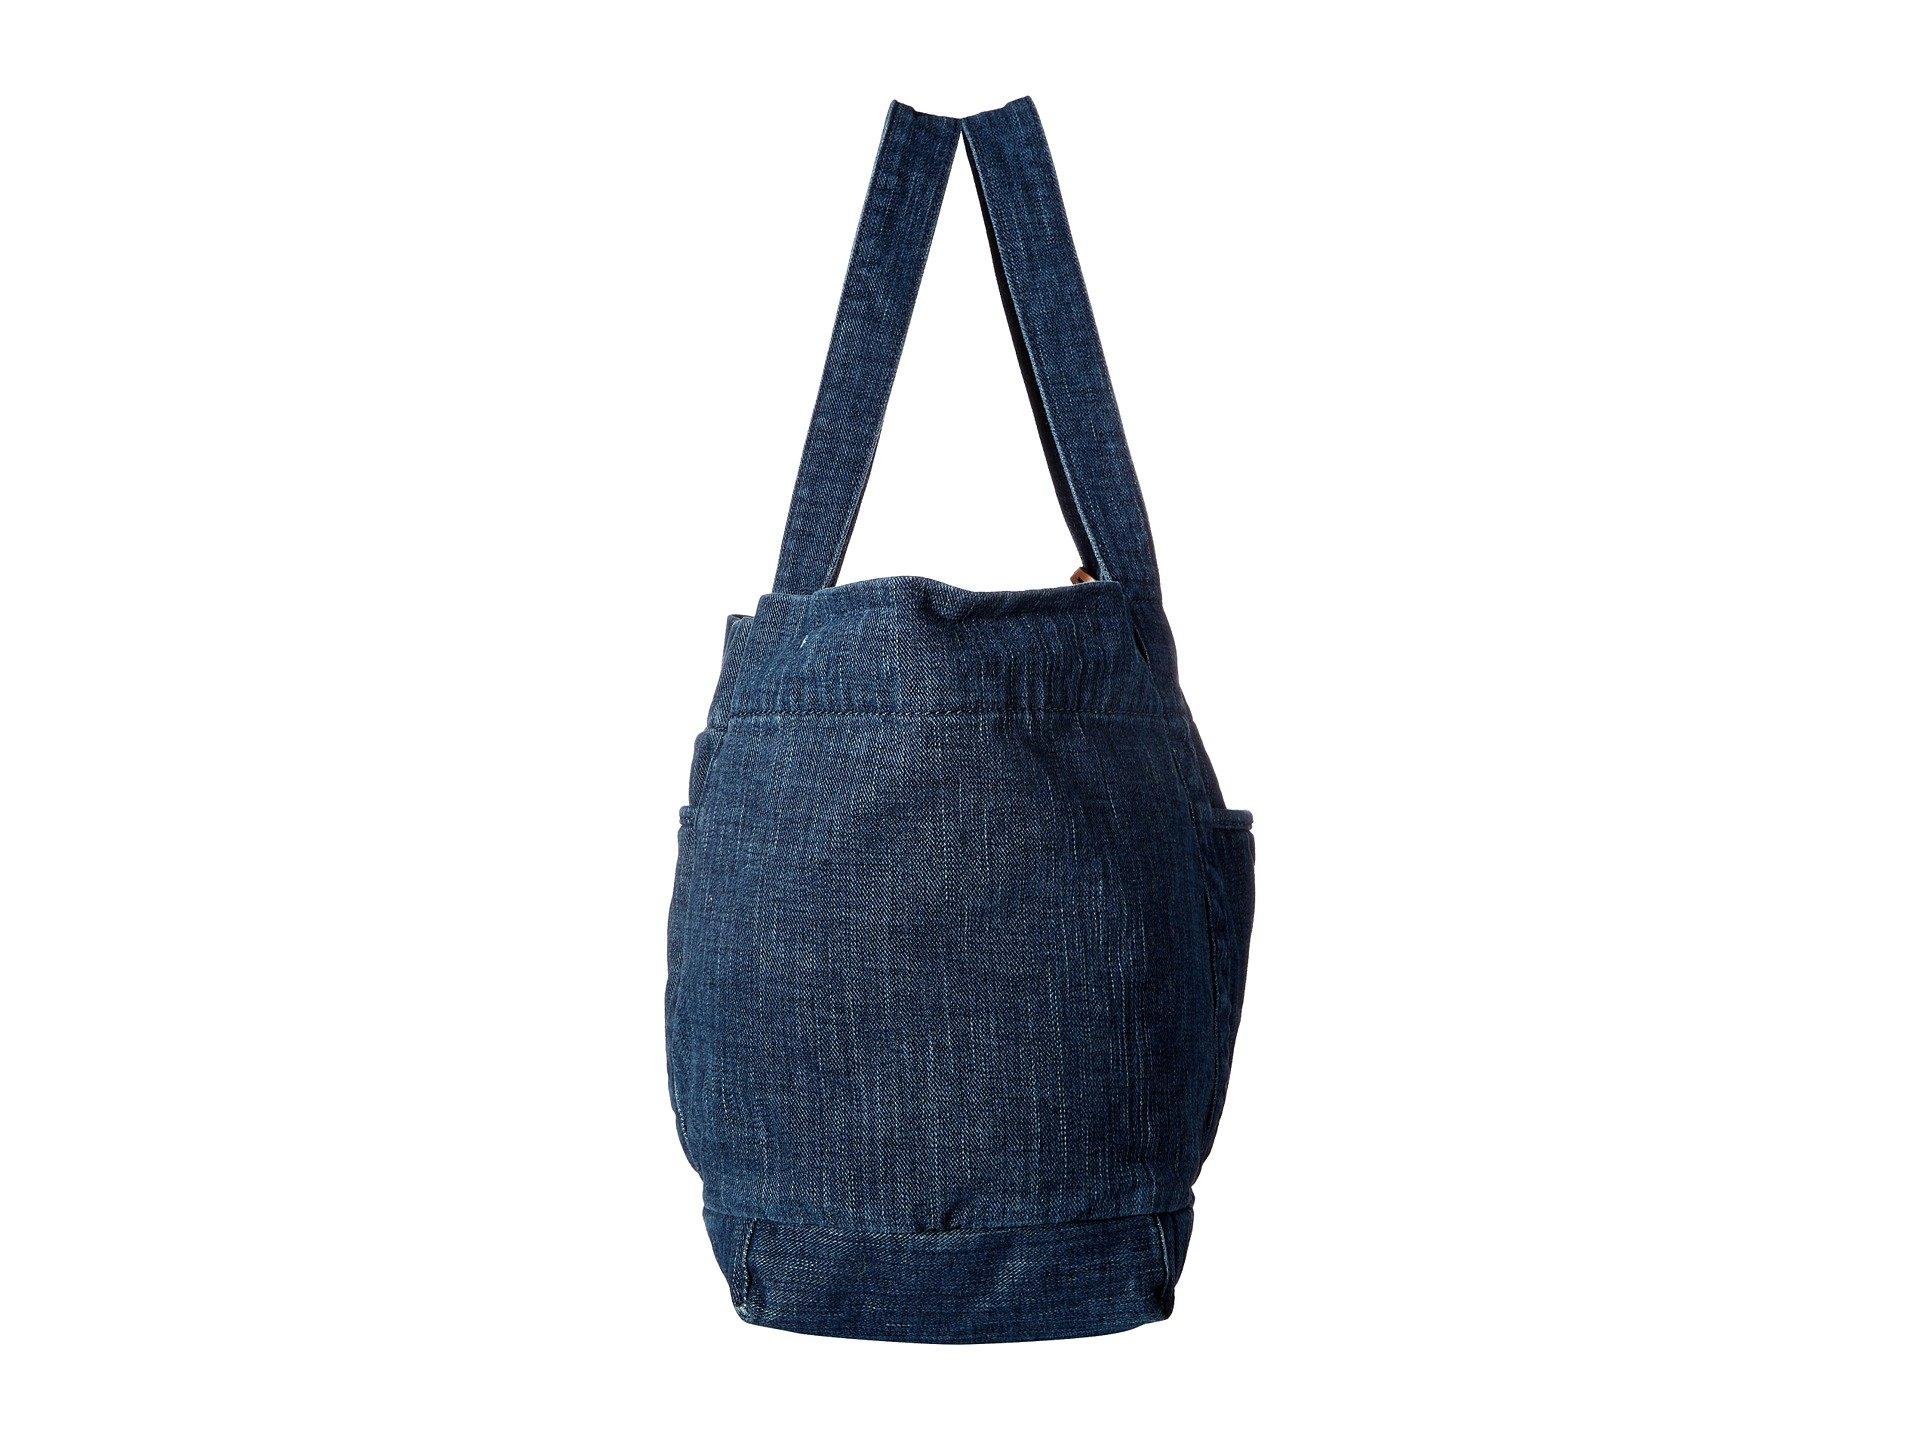 c83ef7963aa3 ... Cross Body Blue Canvas Shoulder Bag Tradesy. Extra Large Denim Tote Michael  Kors